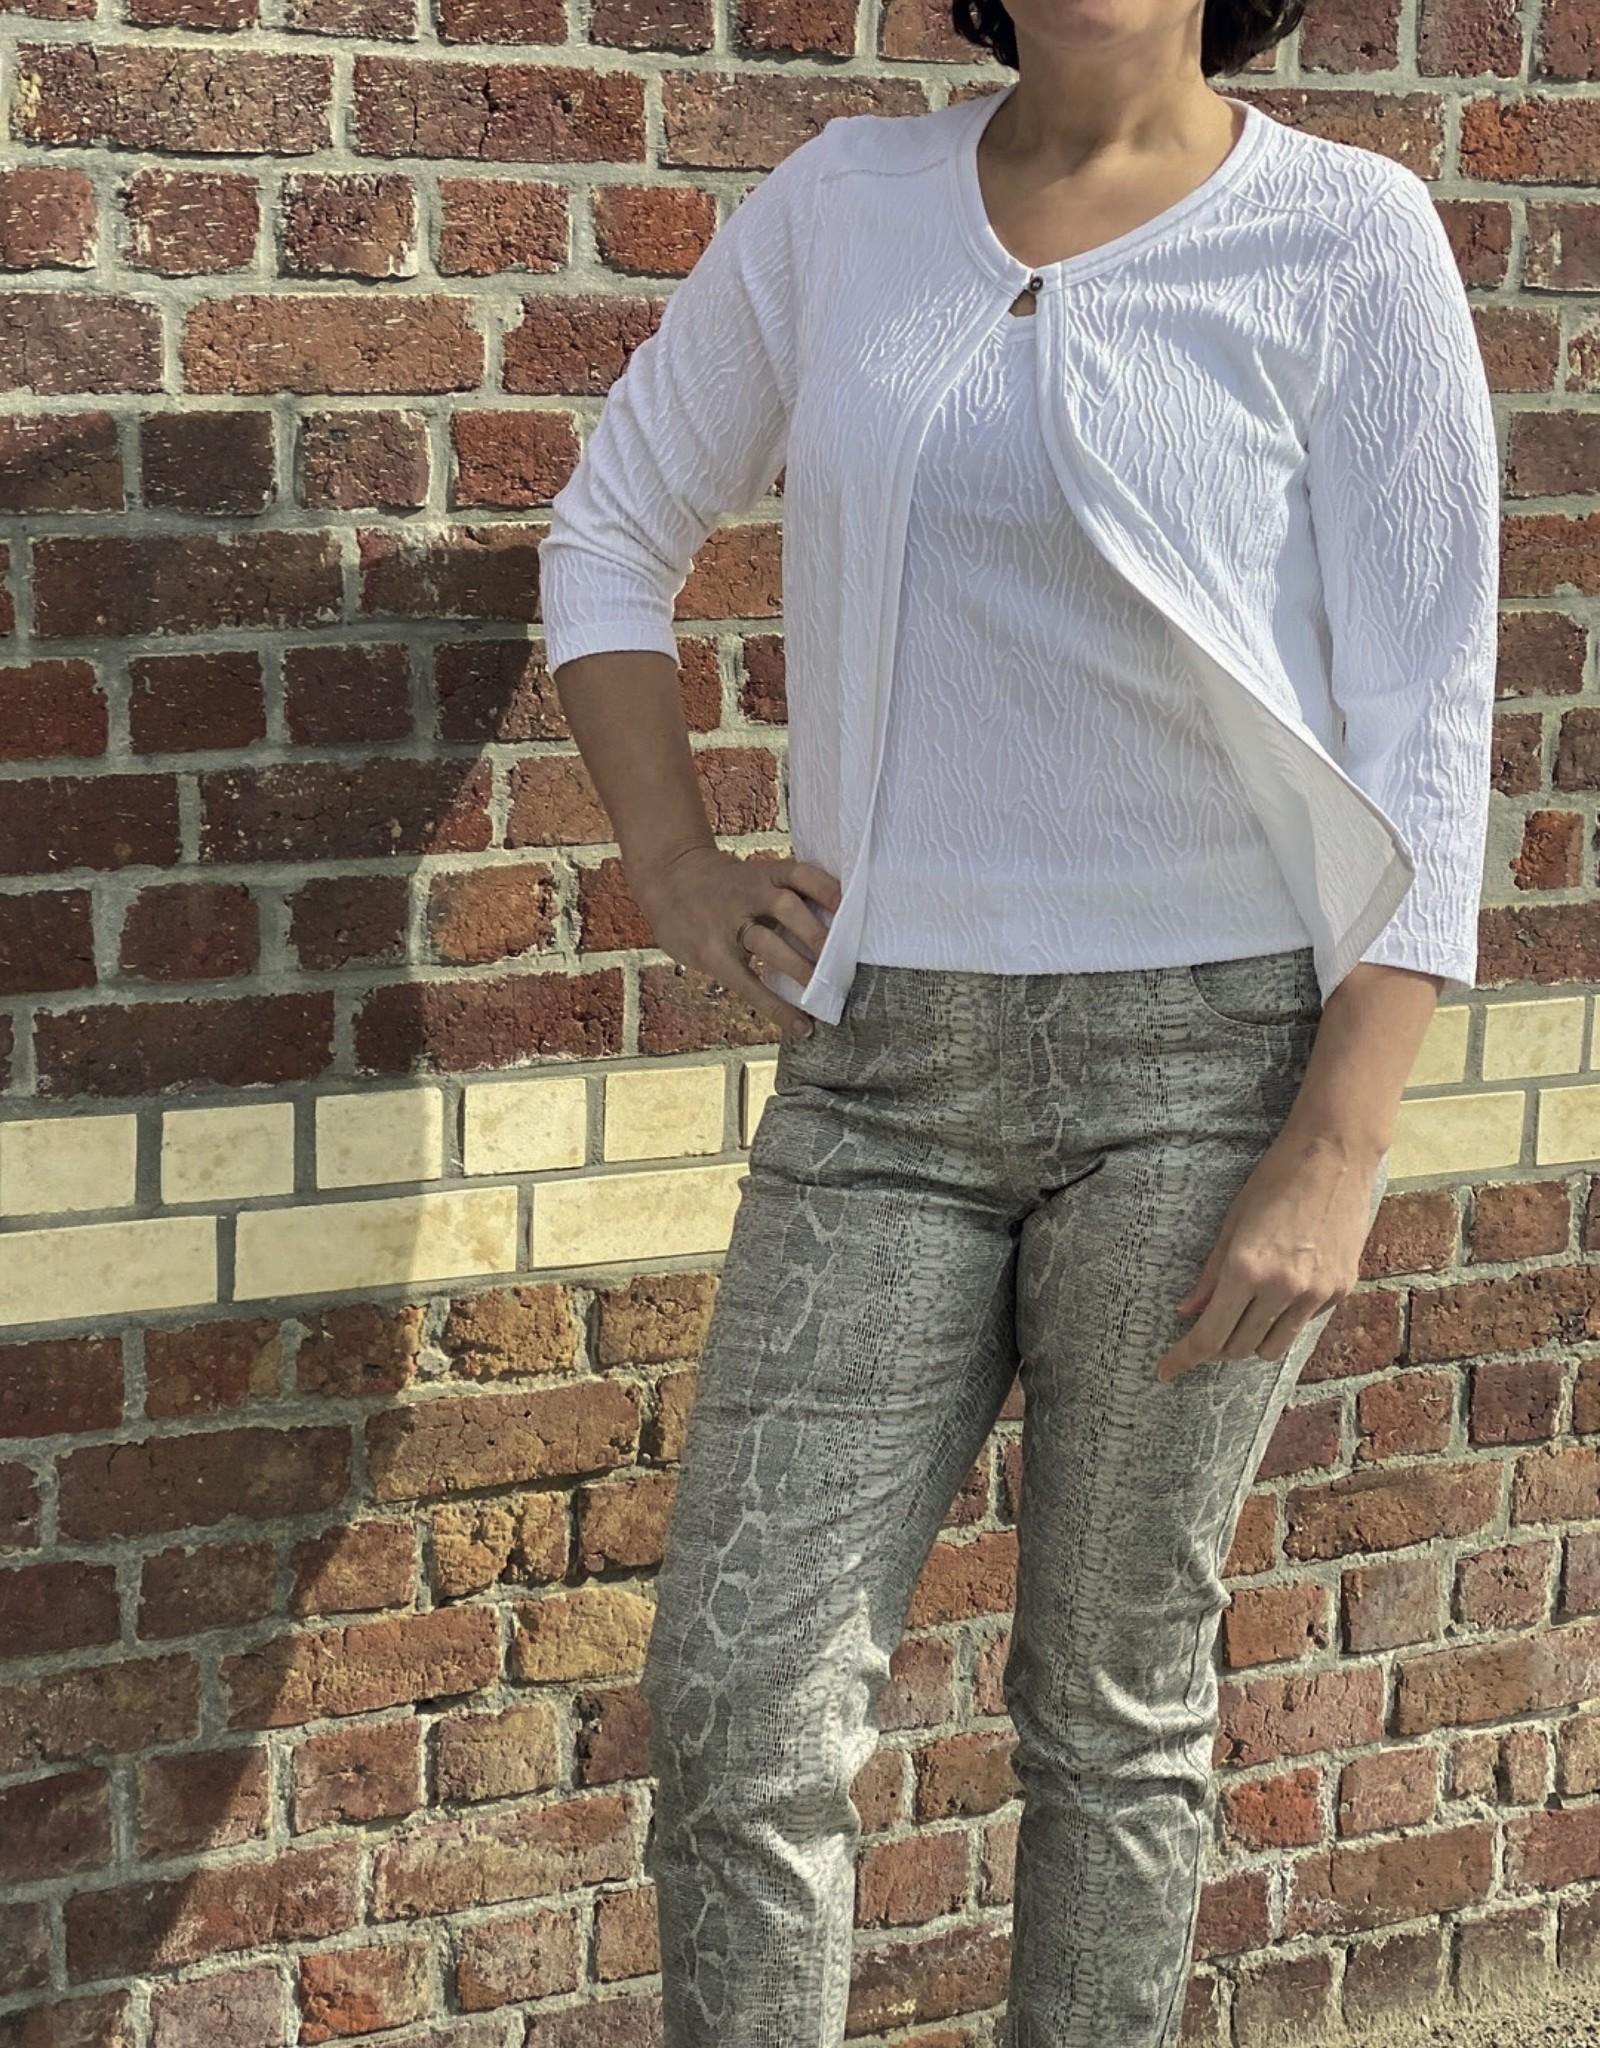 Angels jeans 120030-849/1709 skinny